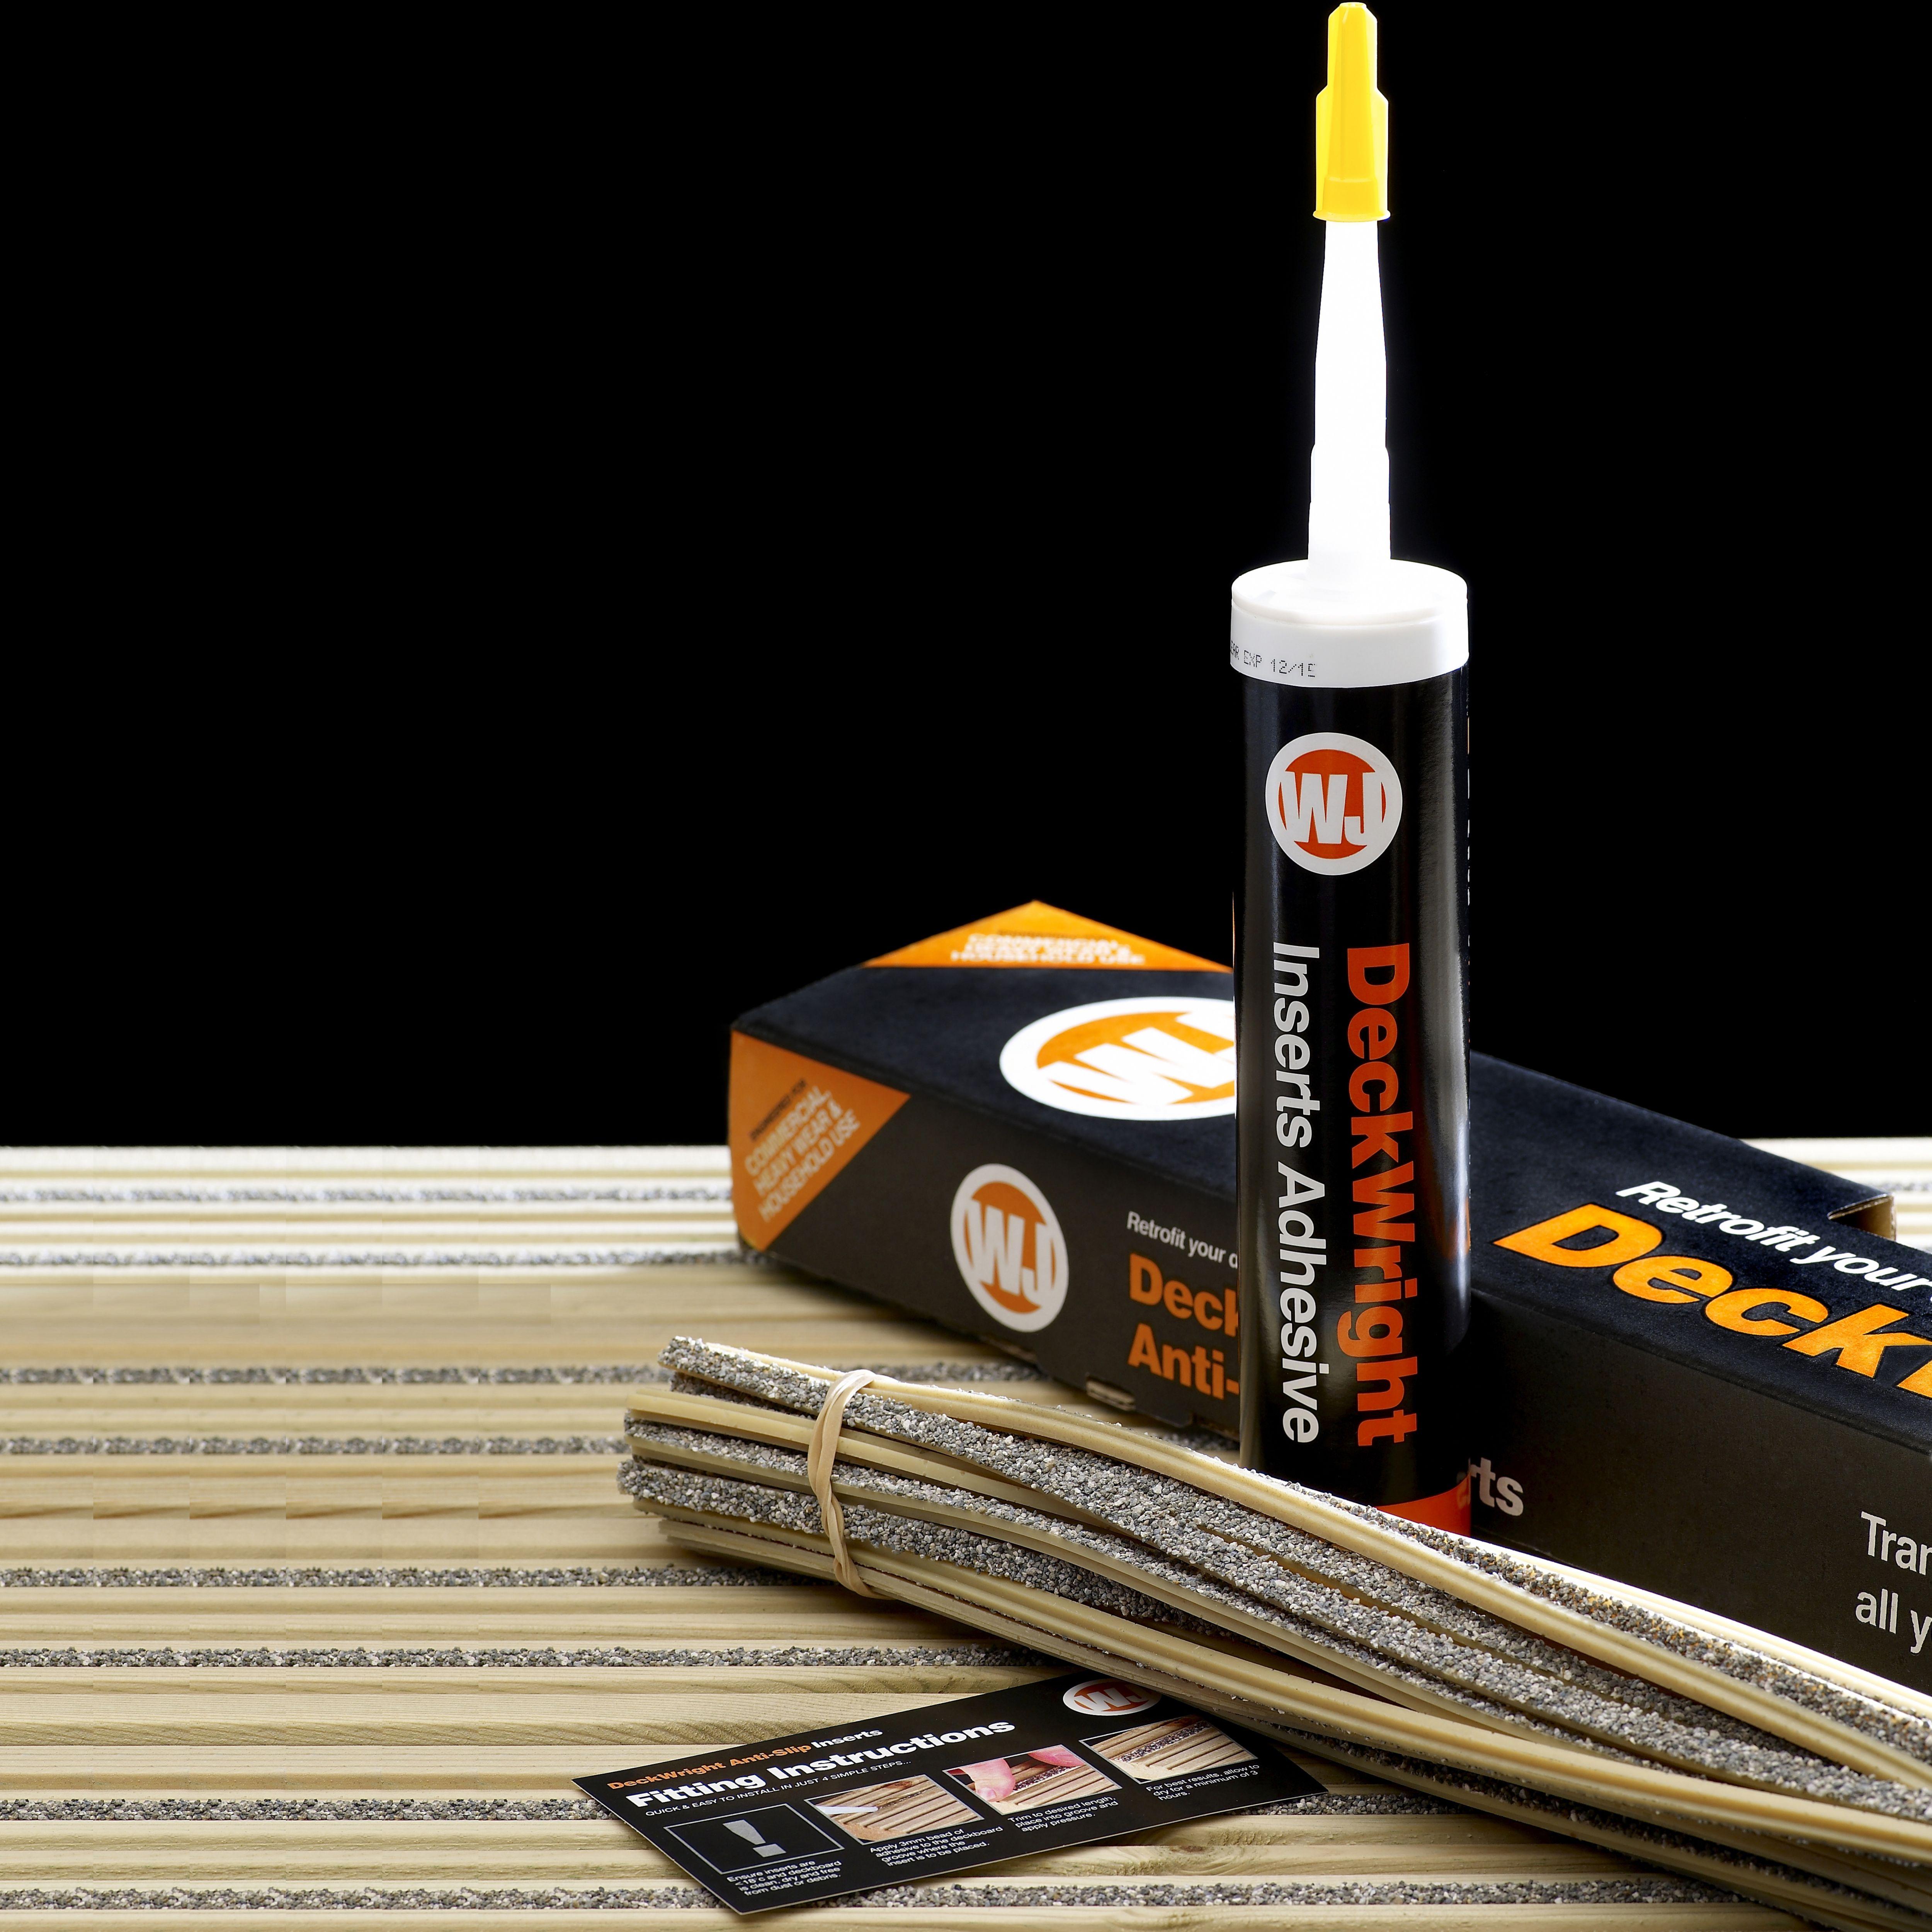 deckwright anti slip decking insert kit departments. Black Bedroom Furniture Sets. Home Design Ideas